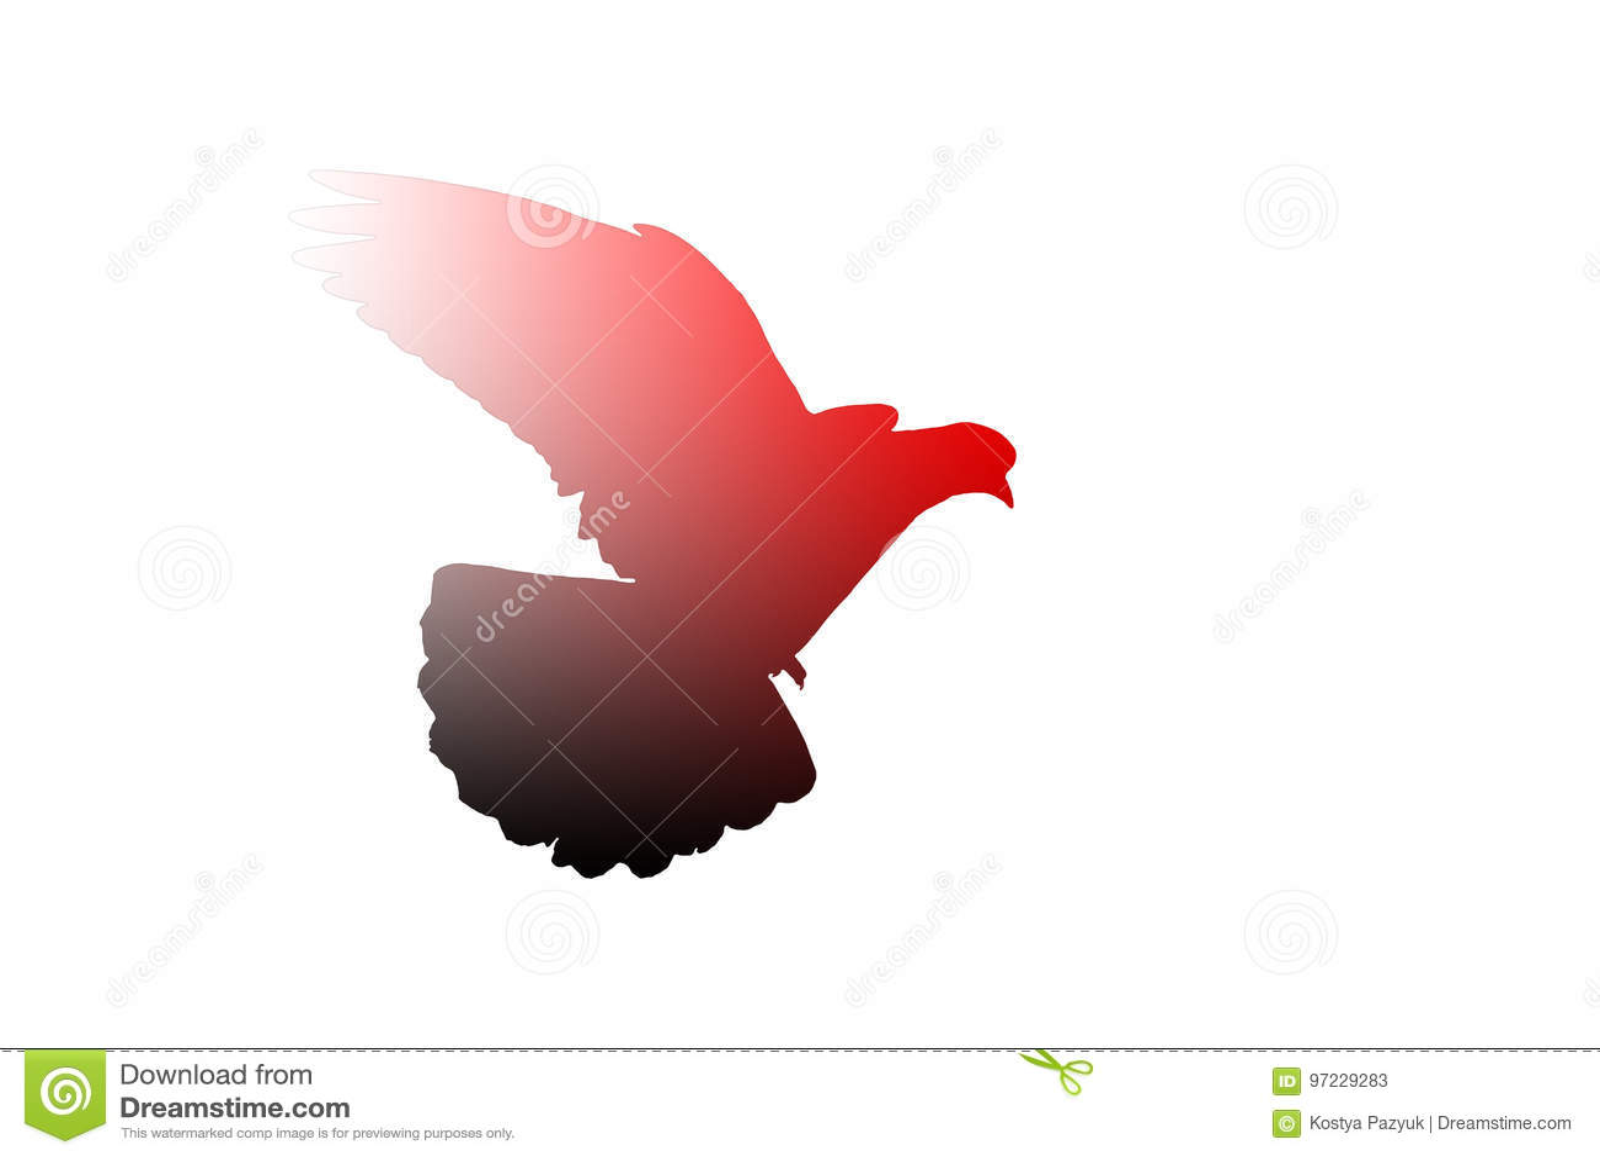 Sacred Bird Of Islam Stock Illustration Illustration Of Gulf 97229283